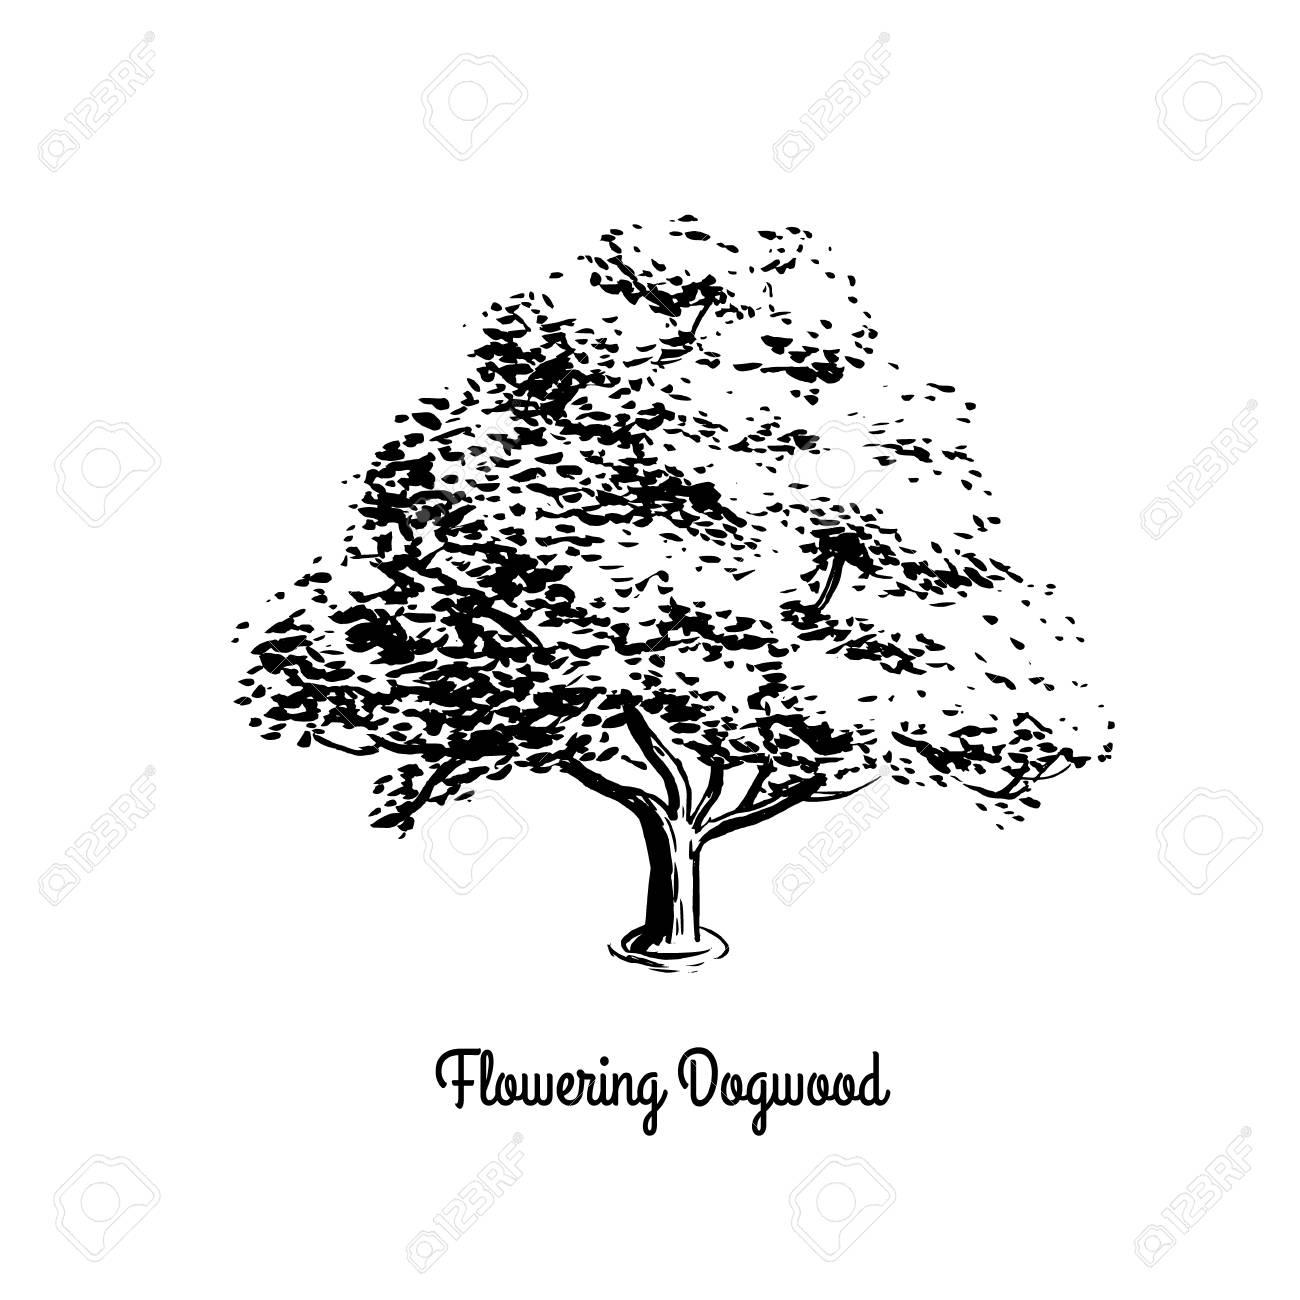 Vector sketch illustration of Flowering Dogwood. Black silhouette...